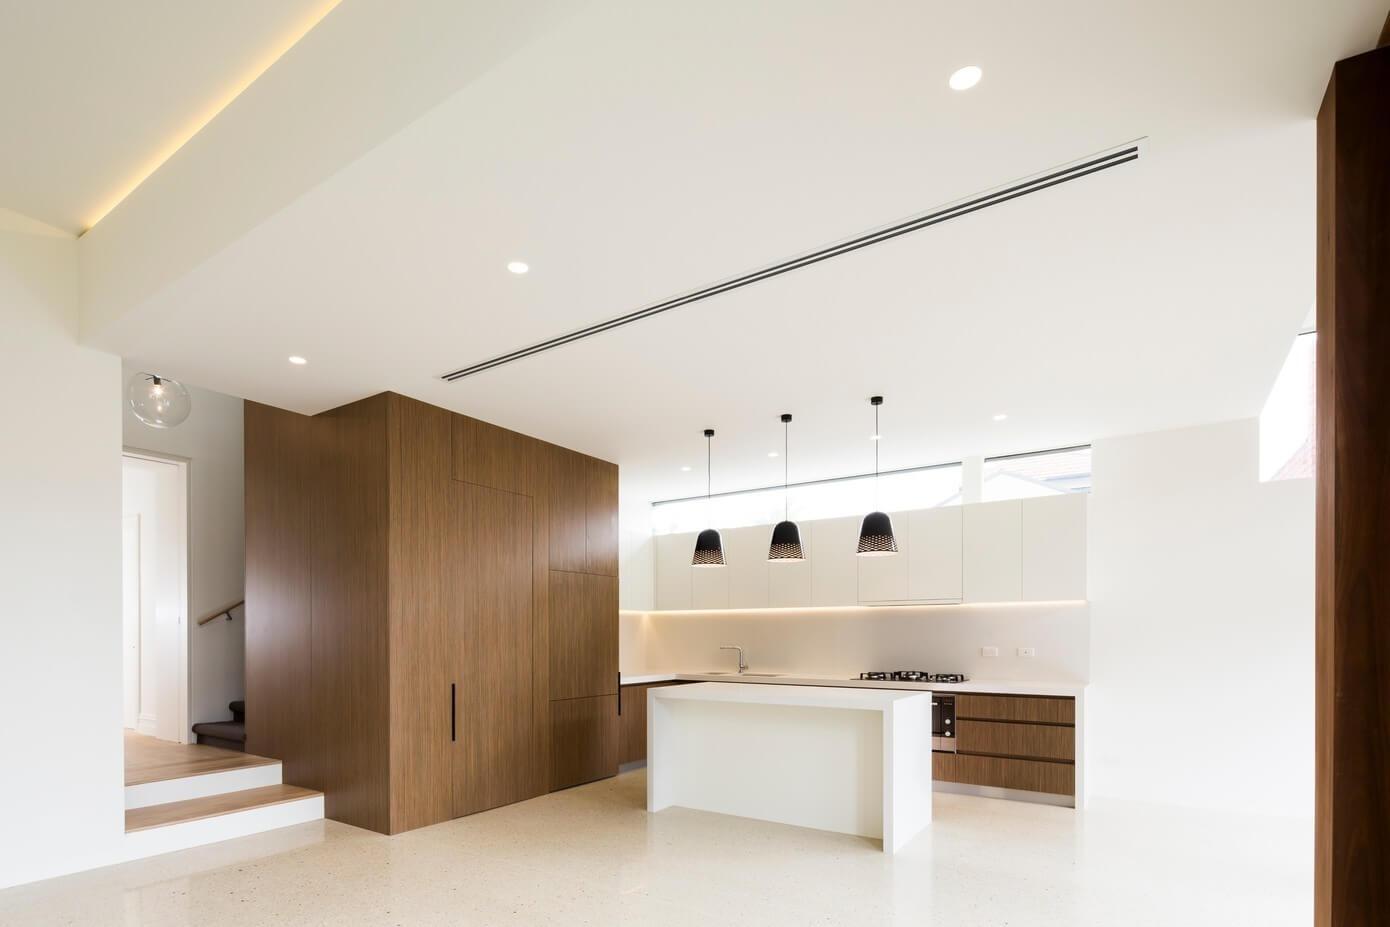 armadale-house-mitsuori-architects-04